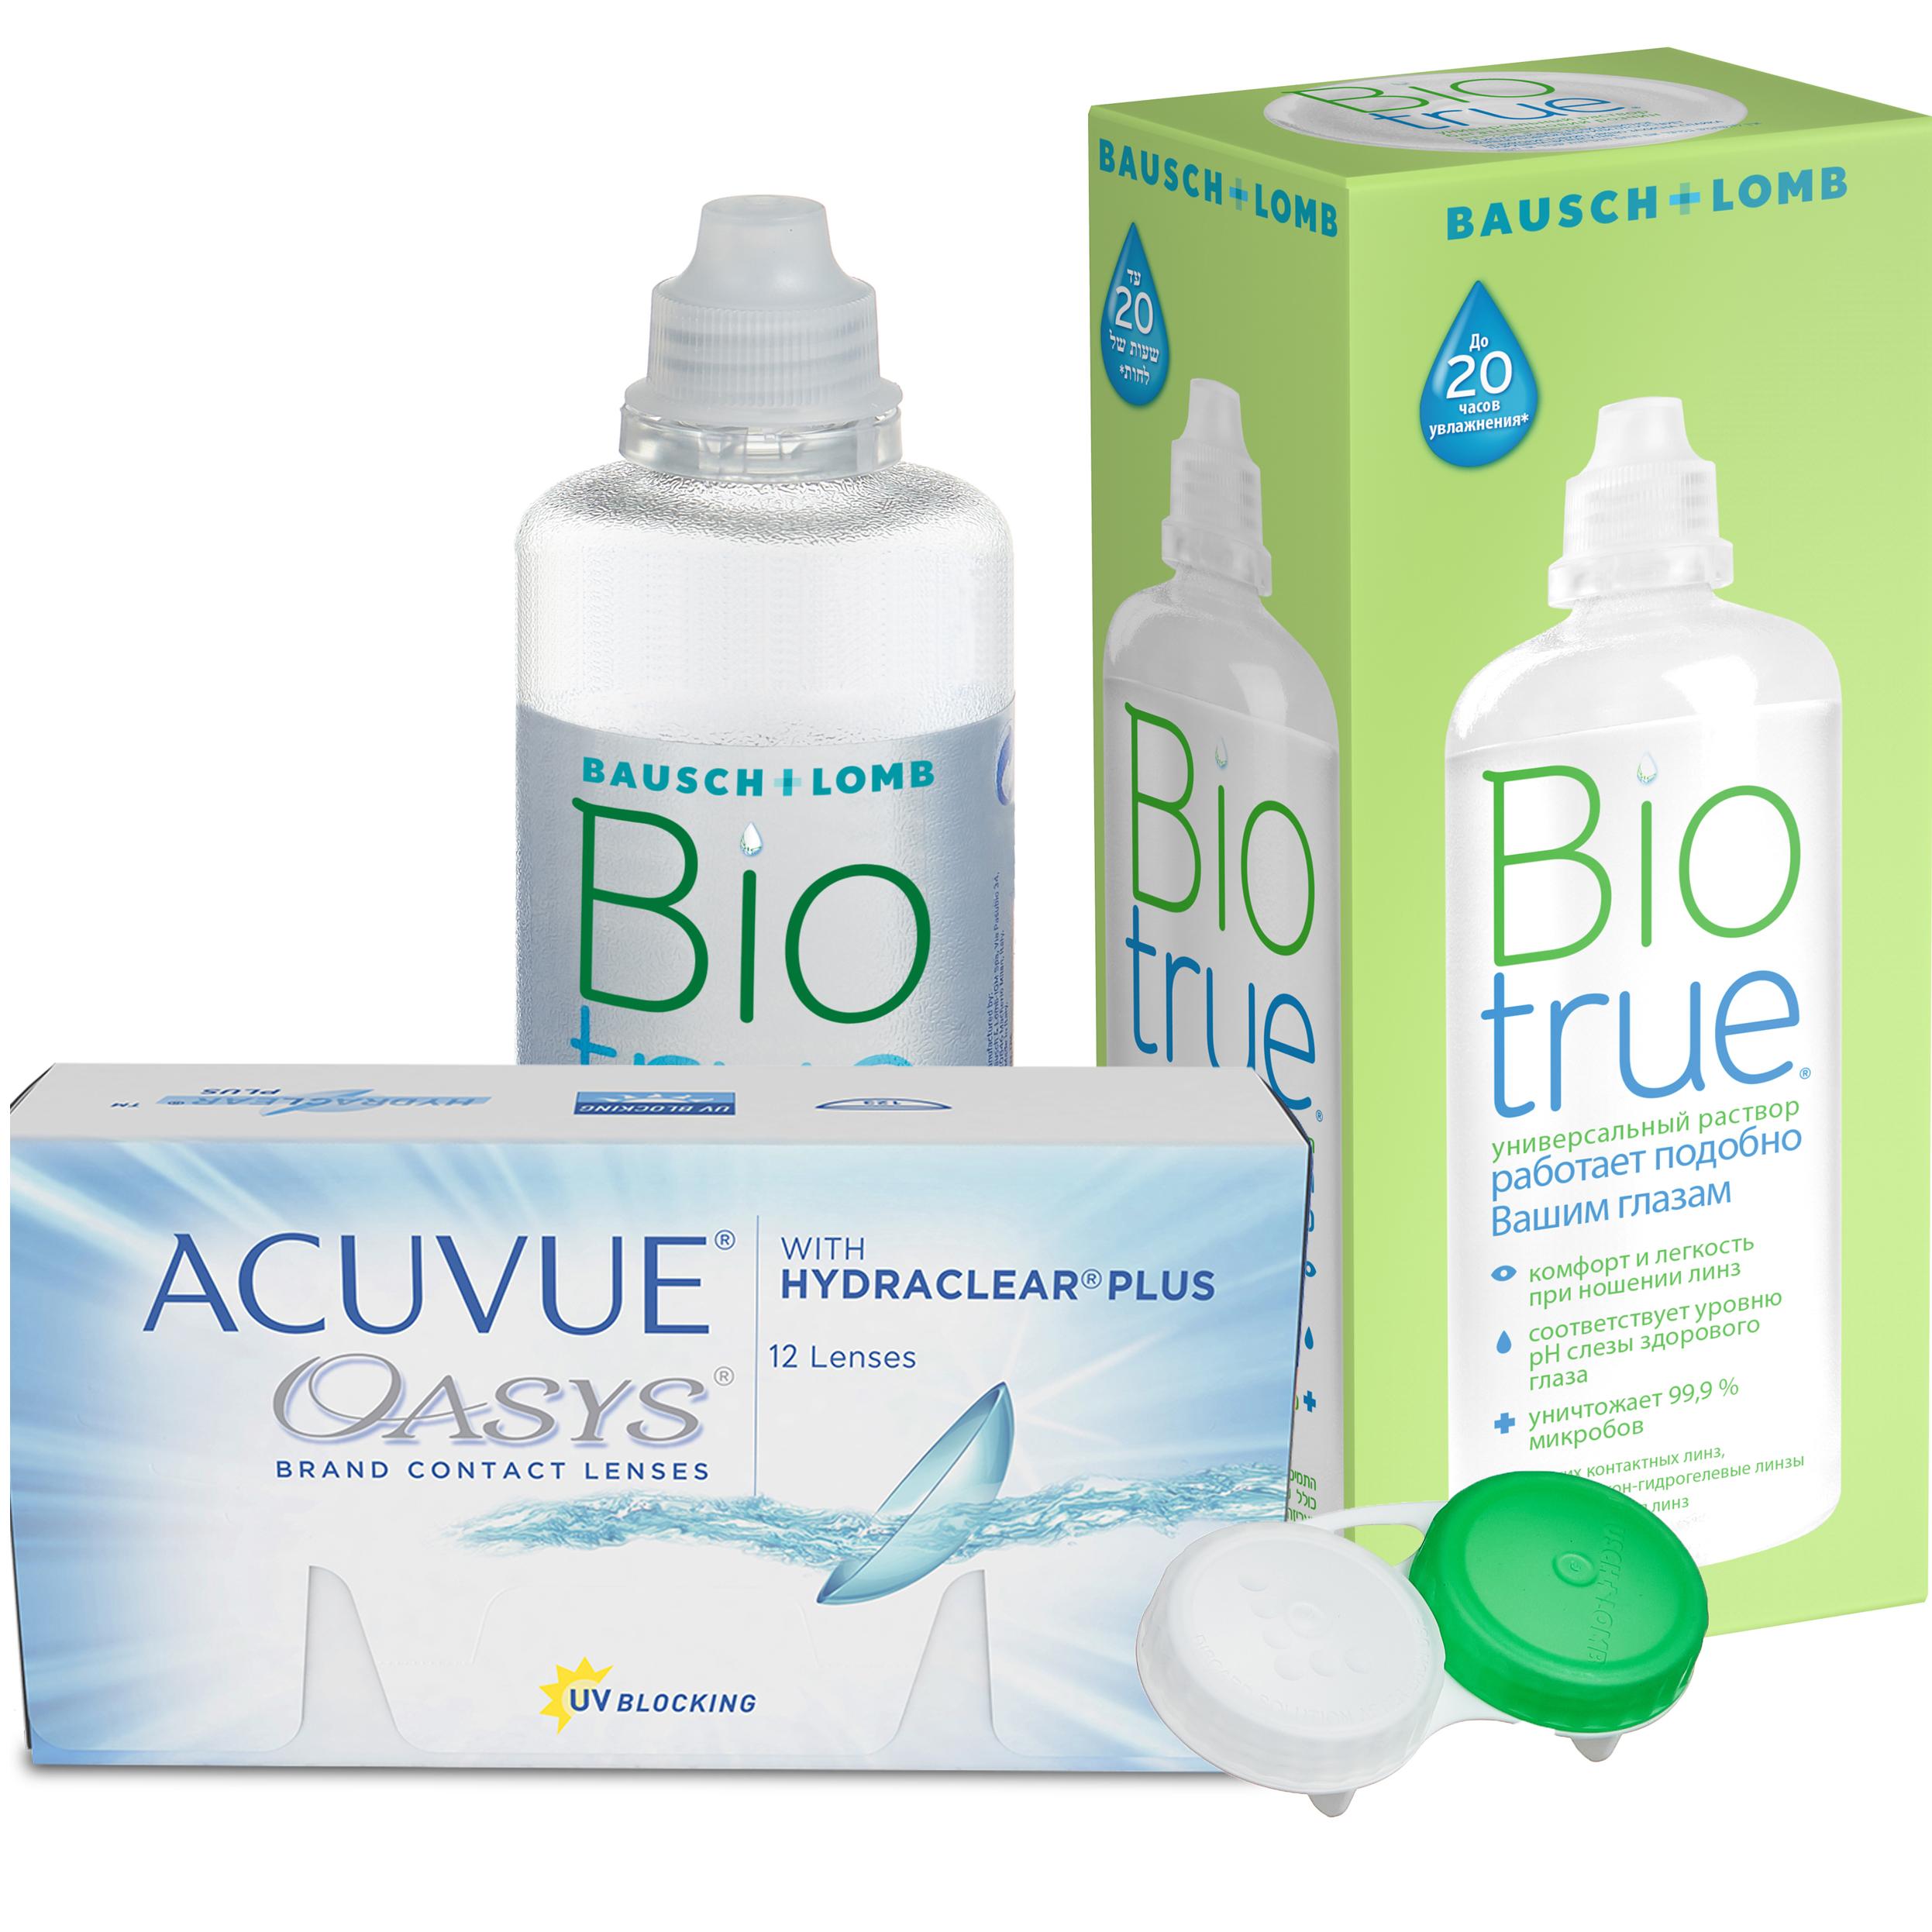 Купить Oasys with Hydraclear Plus 12 линз + Biotrue, Контактные линзы Acuvue Oasys with Hydraclear Plus 12 линз R 8.4 +4, 50 + Biotrue 300 мл